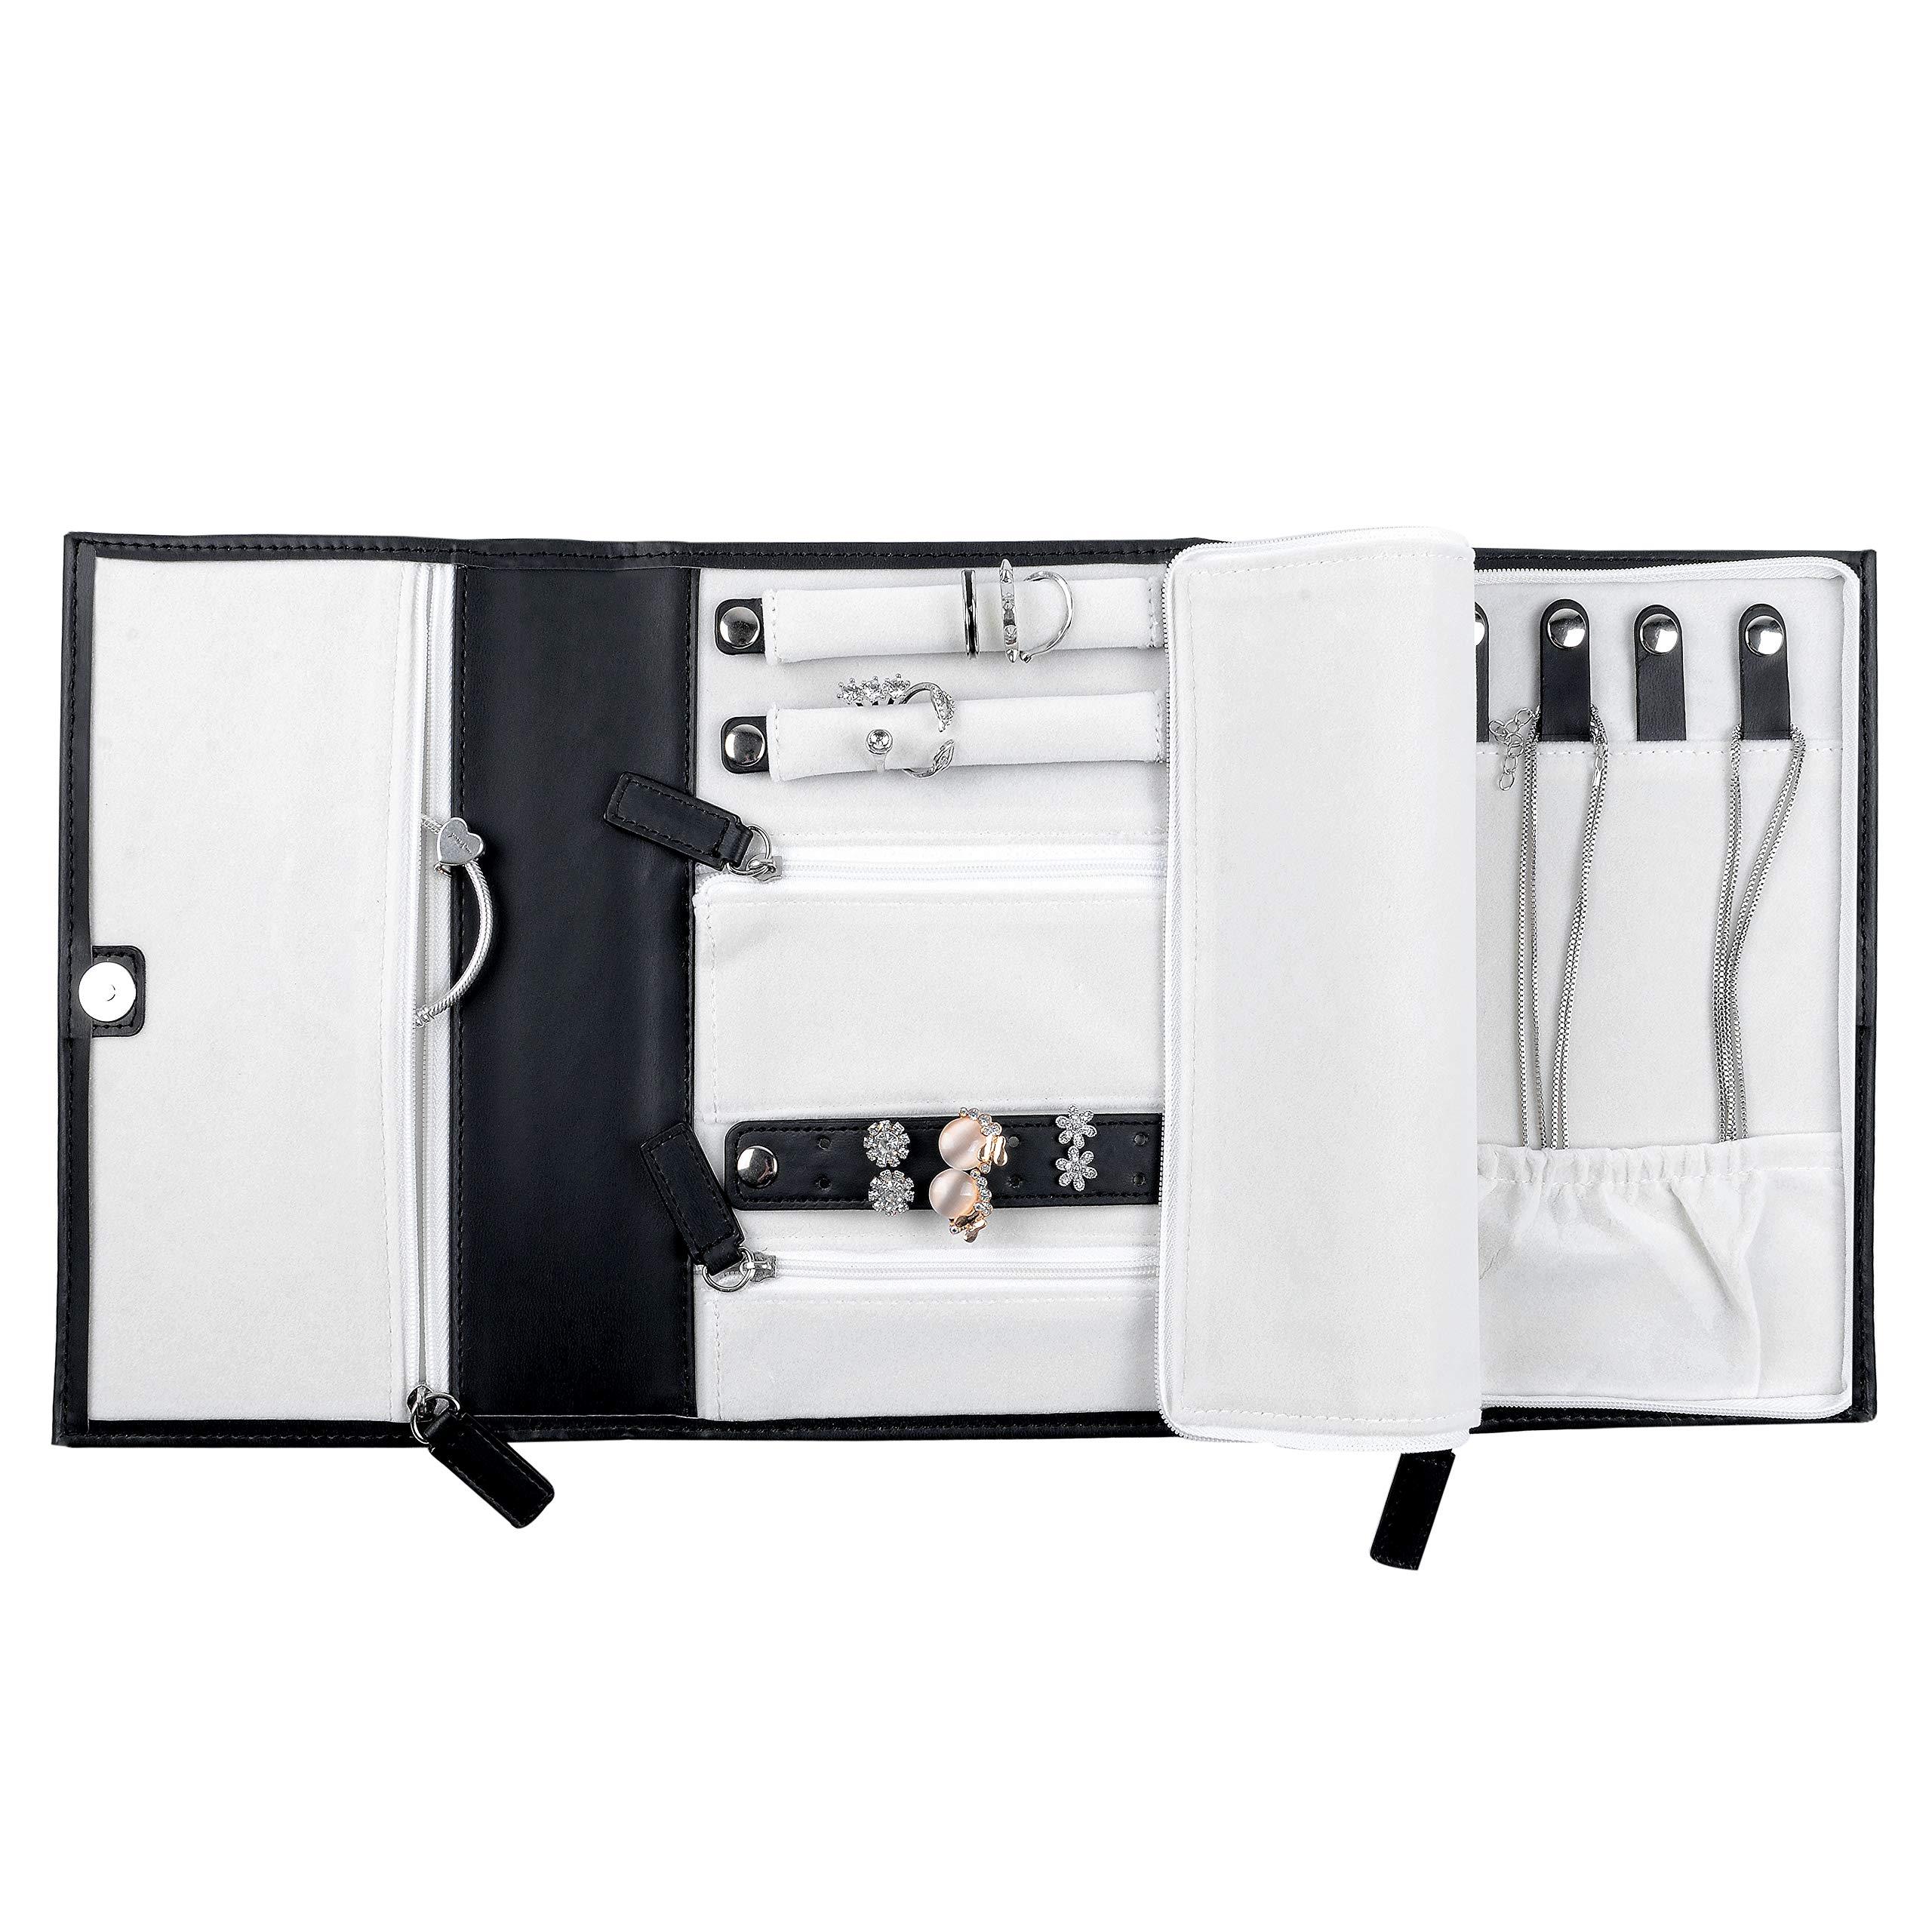 ONLVAN PU Leather Travel Jewelry Case - Jewelry Organizer (Triple 8.26''×6.29''×1.18'', Black) by ONLVAN